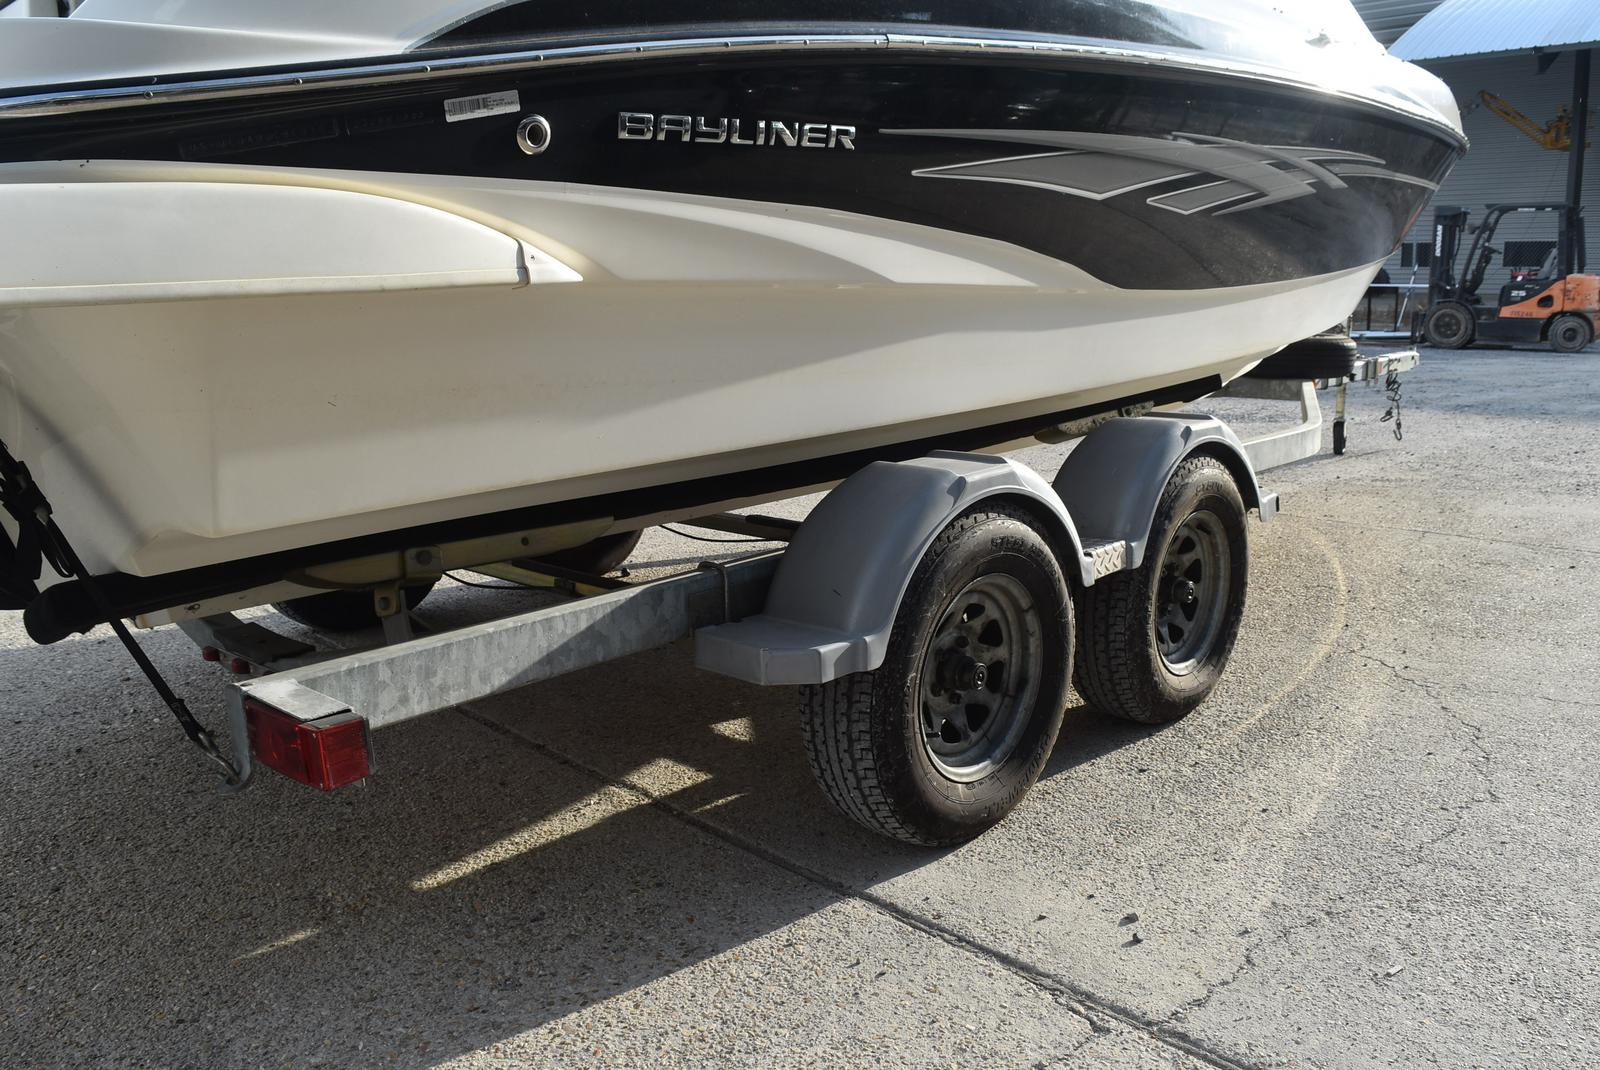 2010 Bayliner boat for sale, model of the boat is 235BR & Image # 34 of 43